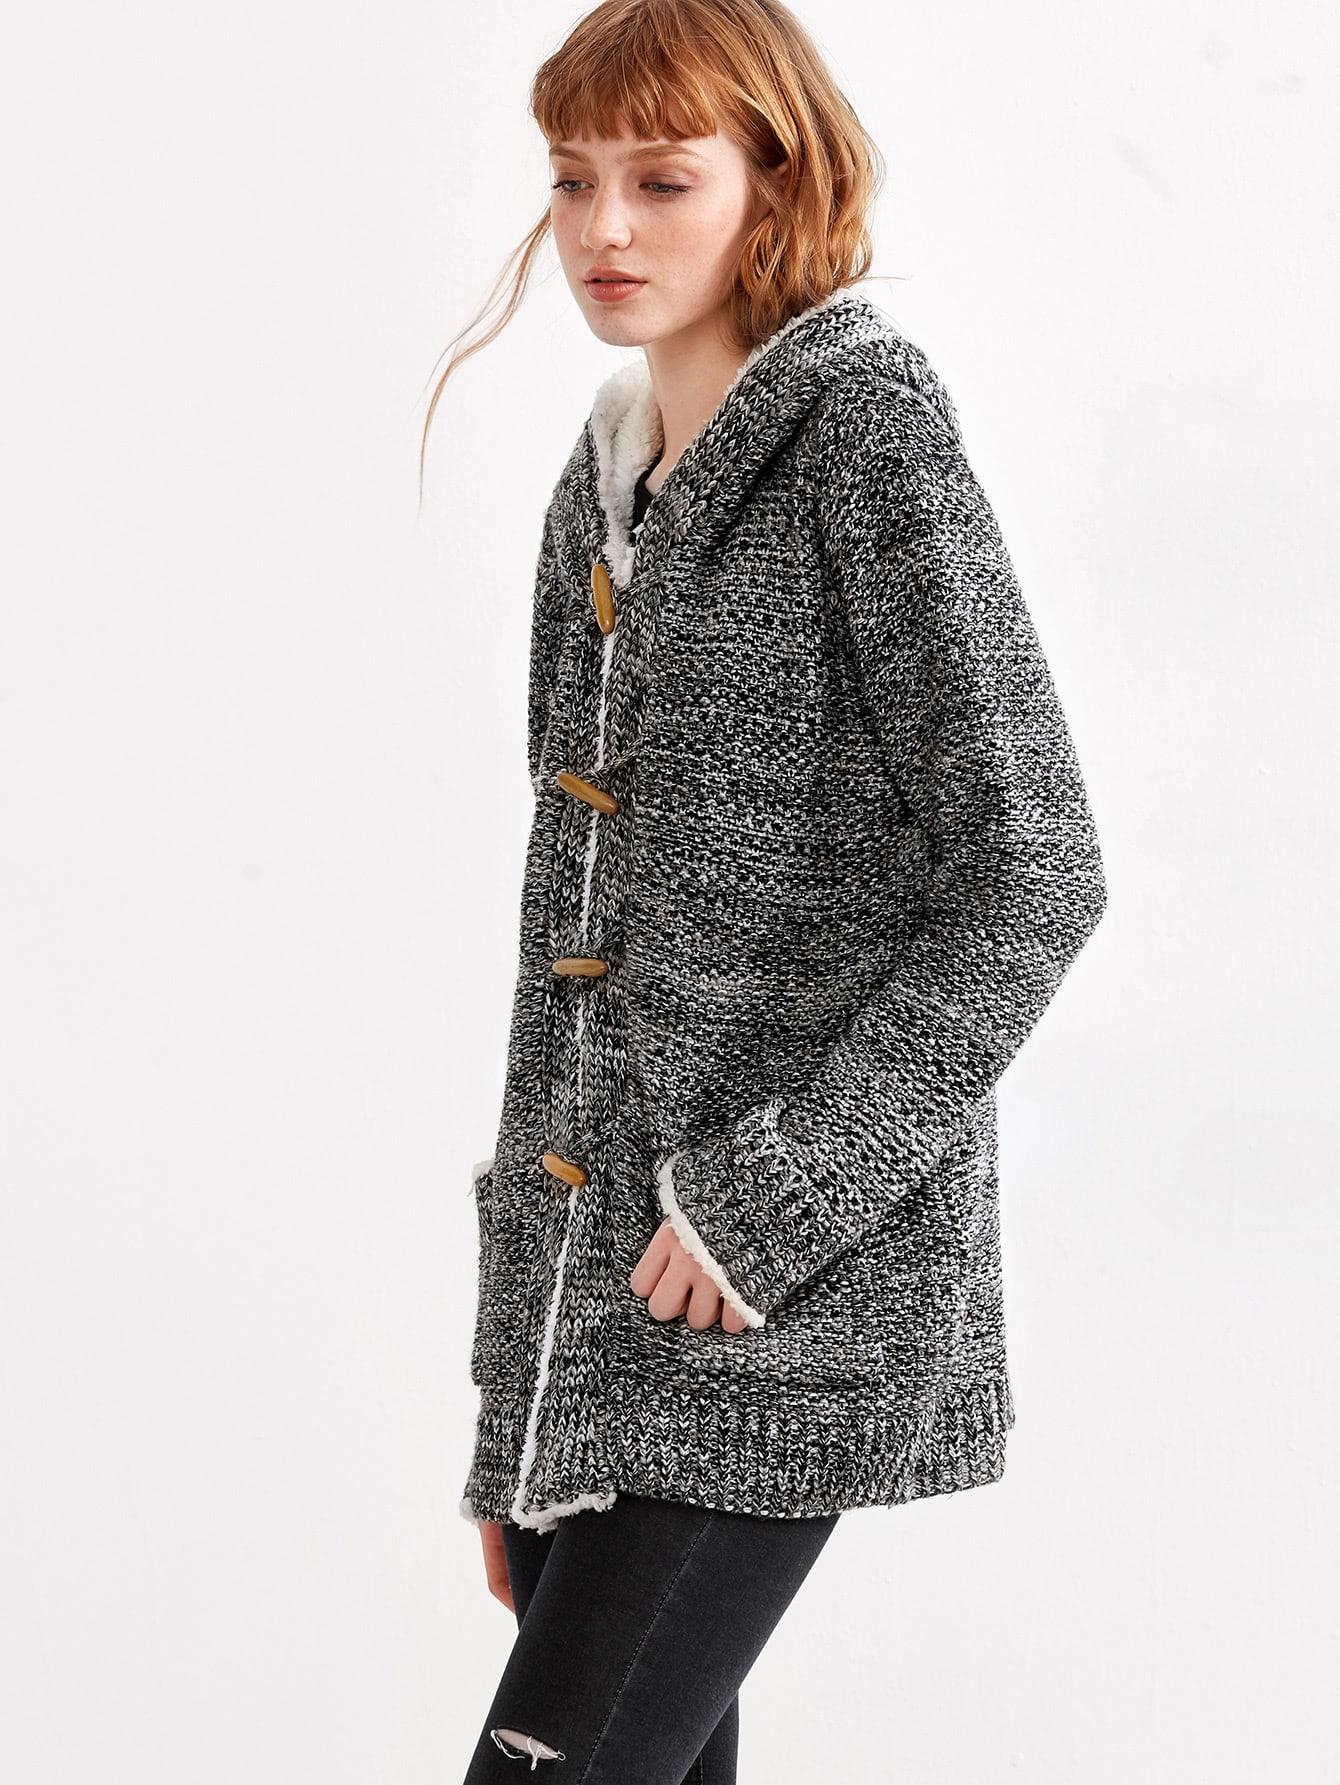 Grey Marled Knit Faux Shearling Neckline Duffle Sweater CoatGrey Marled Knit Faux Shearling Neckline Duffle Sweater Coat<br><br>color: Grey<br>size: one-size